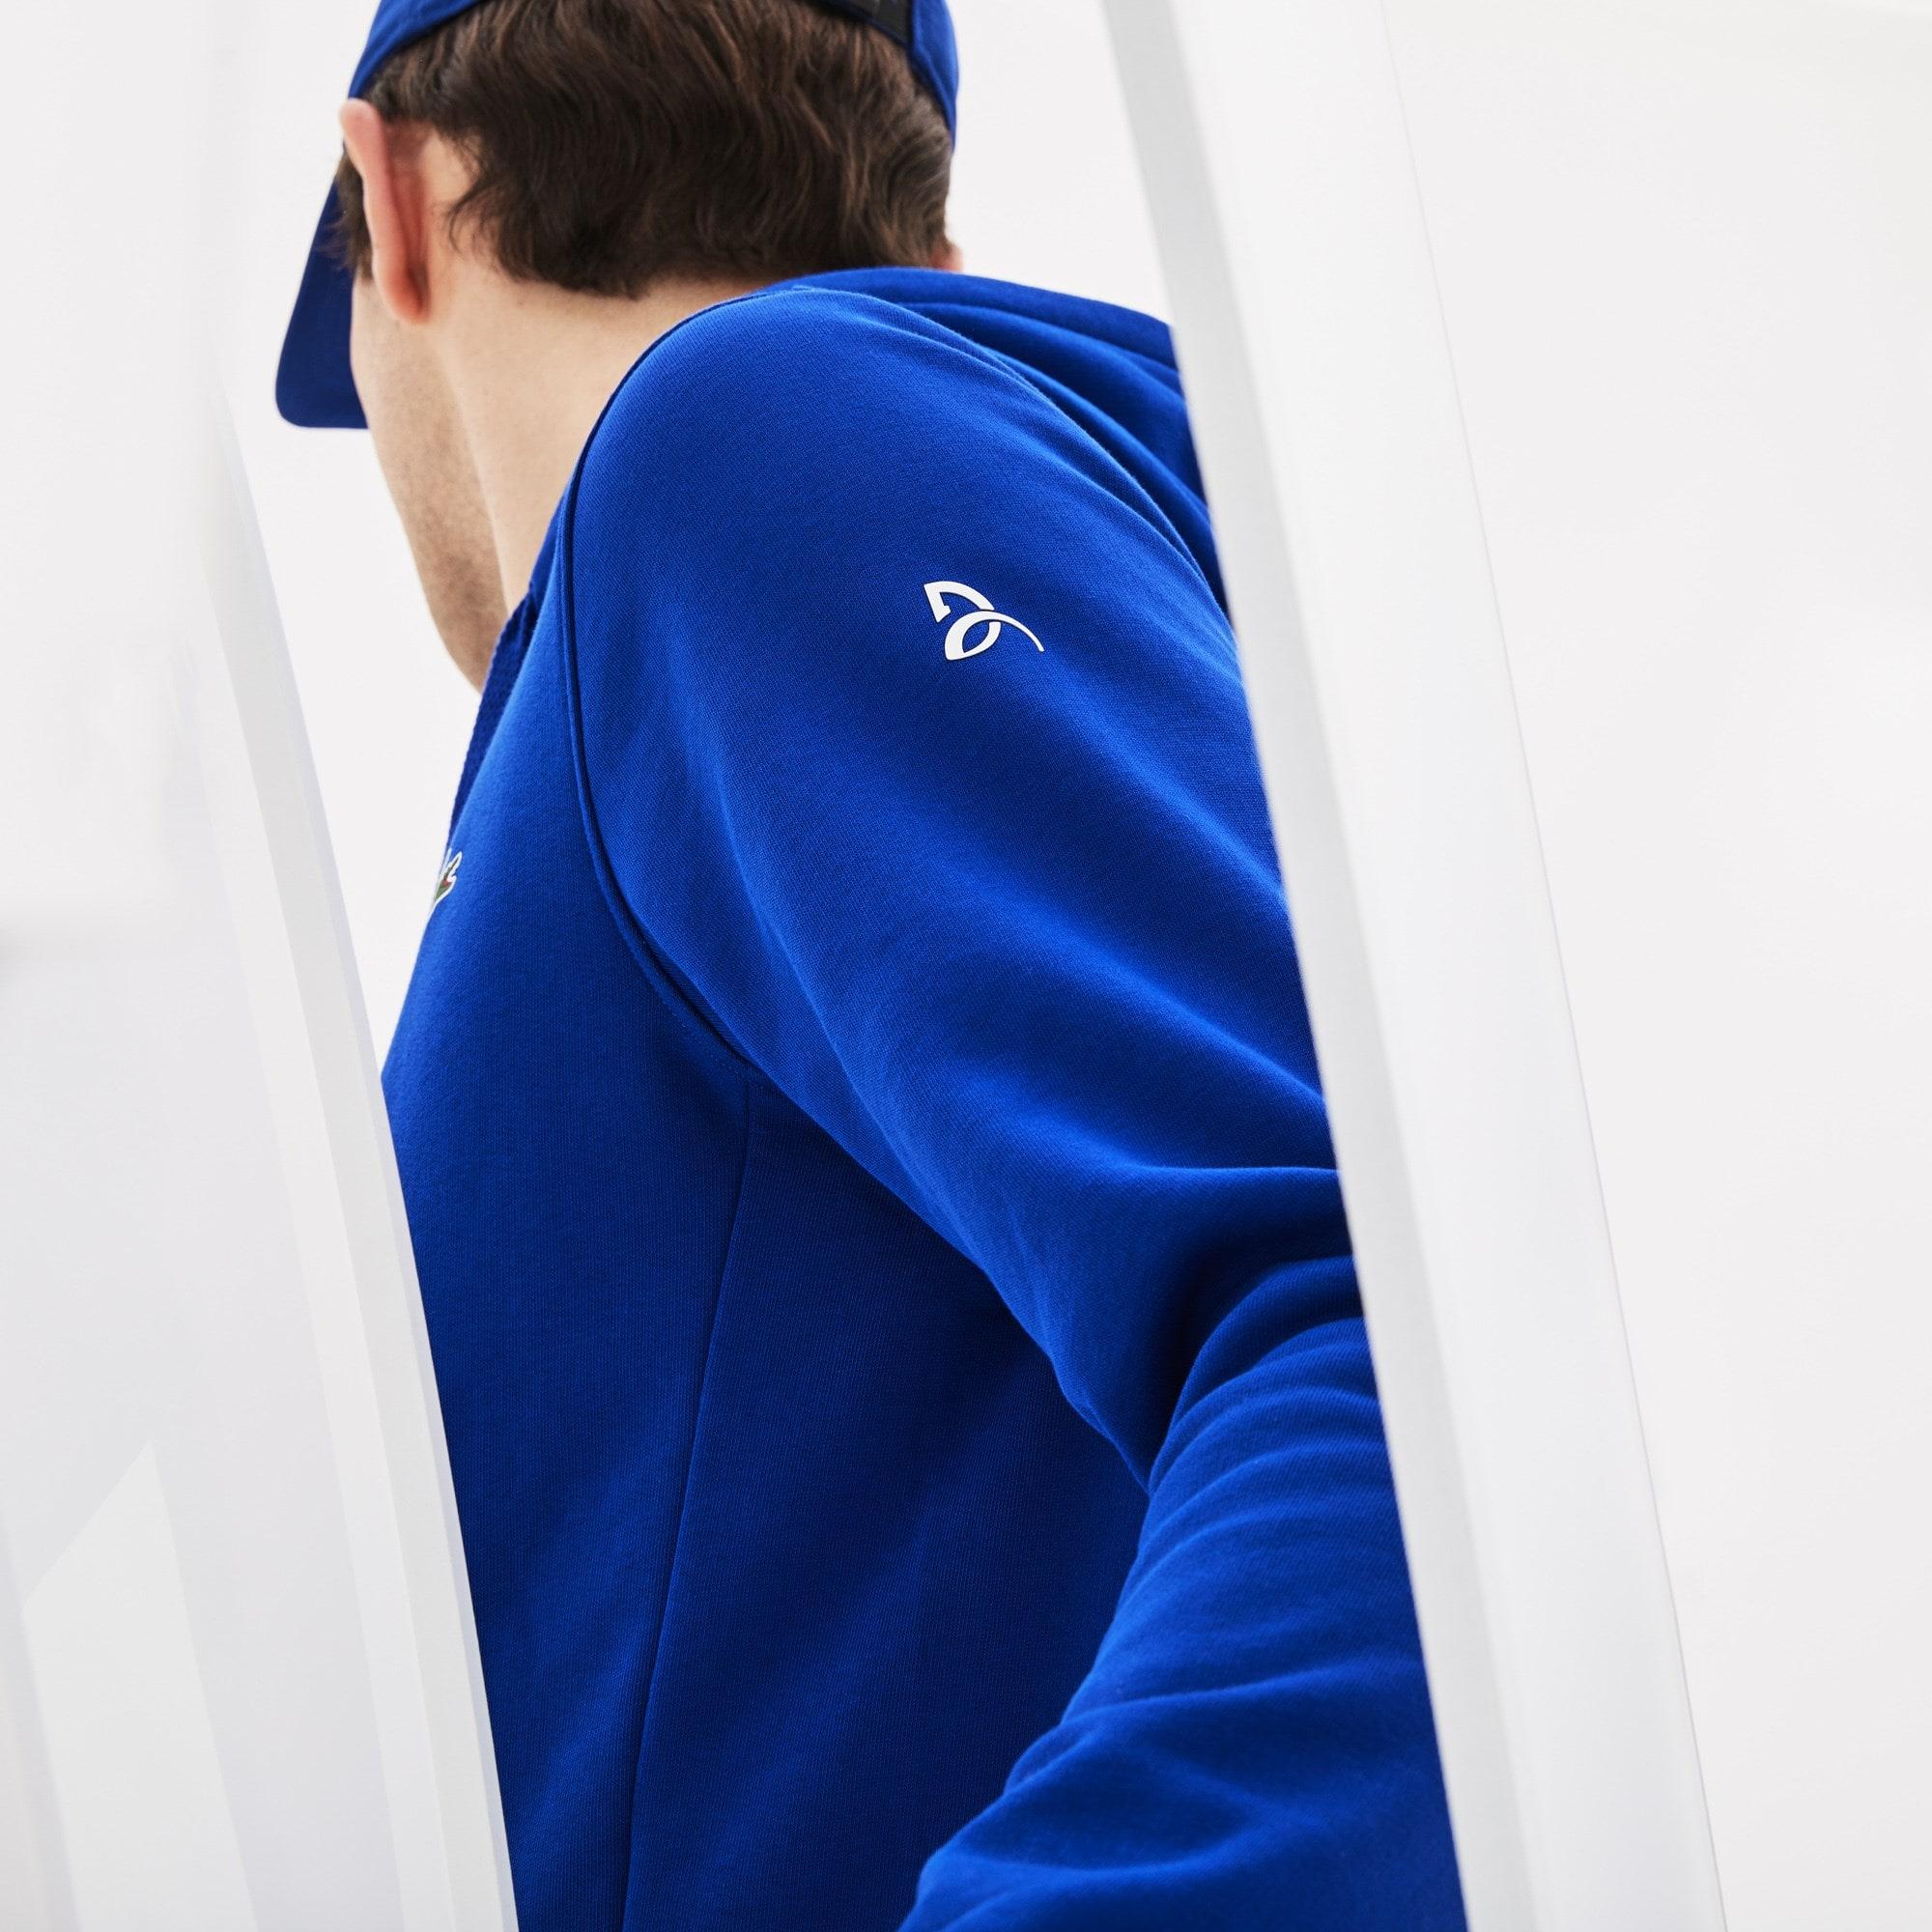 Zippé Sweatshirt Capuche Lacoste Djokovic X Imprimé Sport À Novak 7ygYbfvI6